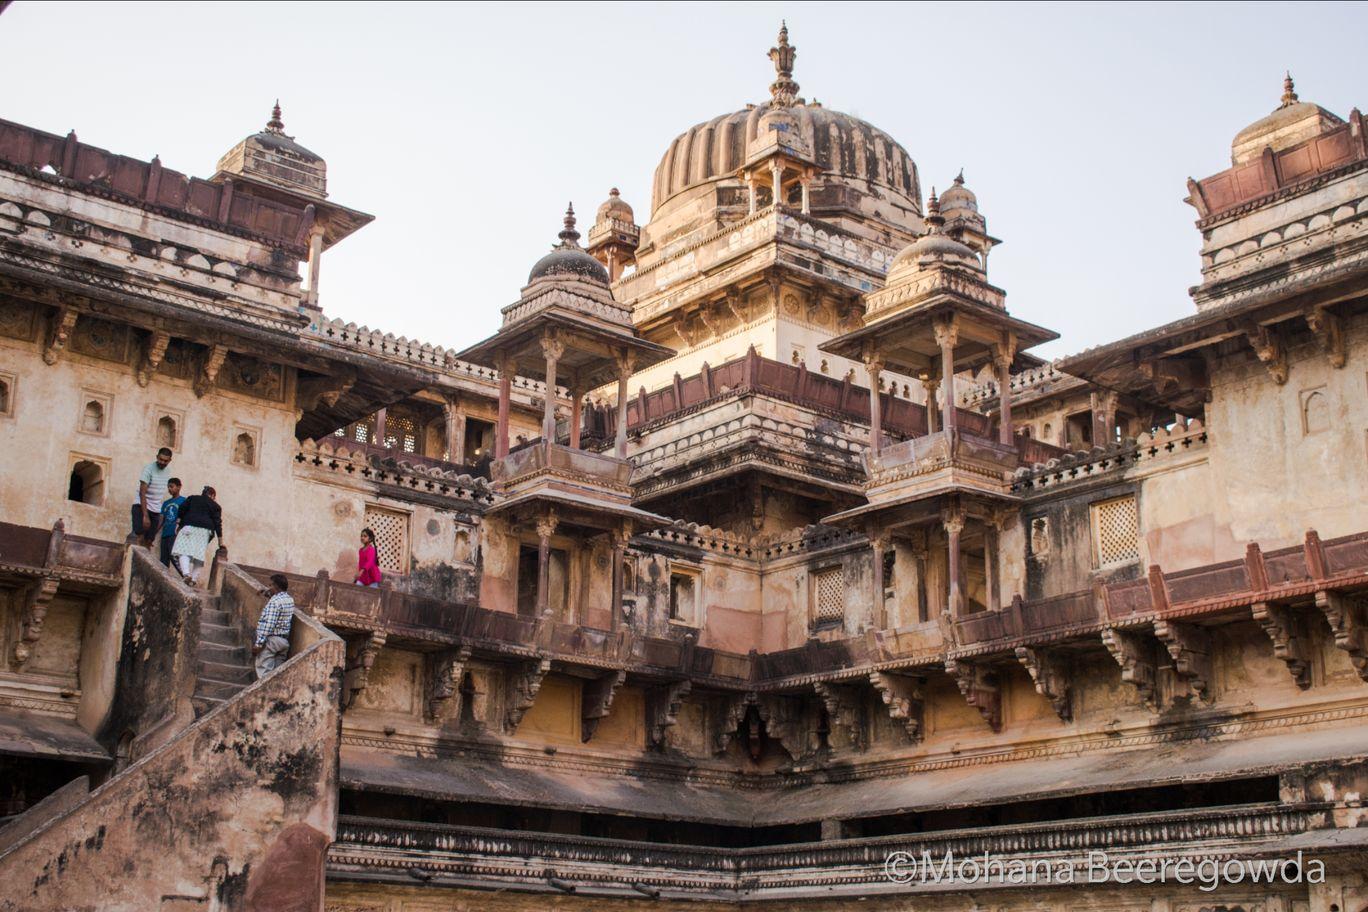 Photo of Orchha Palace By Mohana Beeregowda